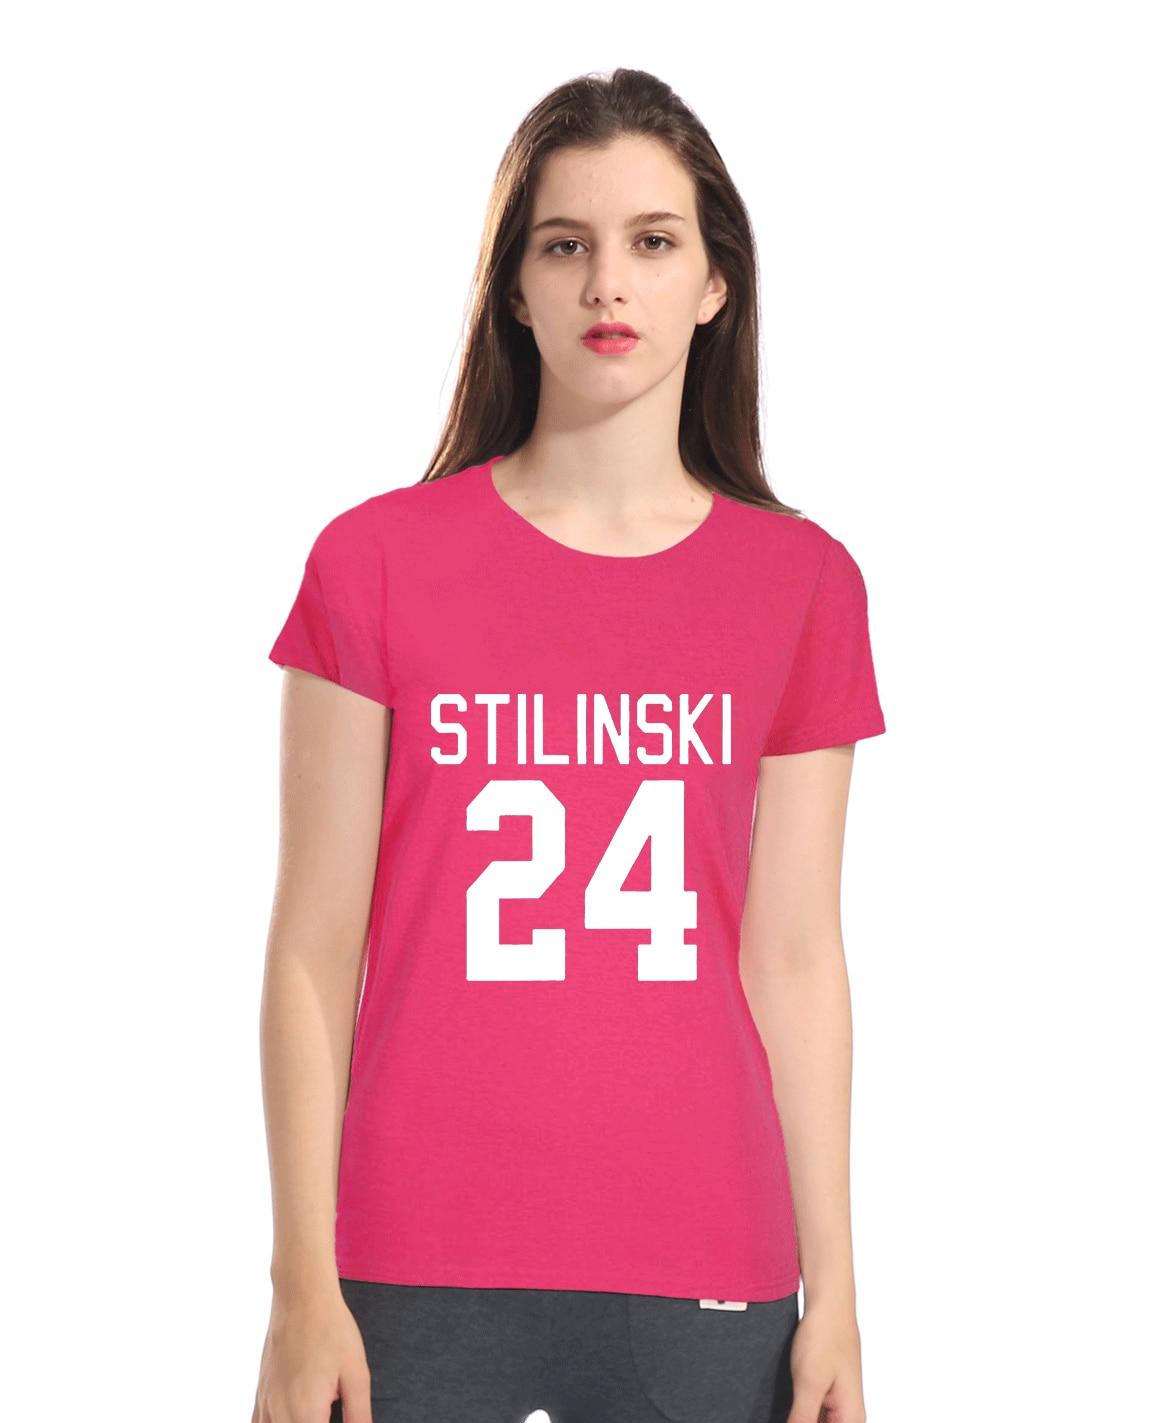 2019 summer women's T-shirts printed STILINSKI 24 fashion hip hop streetwear female T-shirt top lady tee shirt femme harajuku